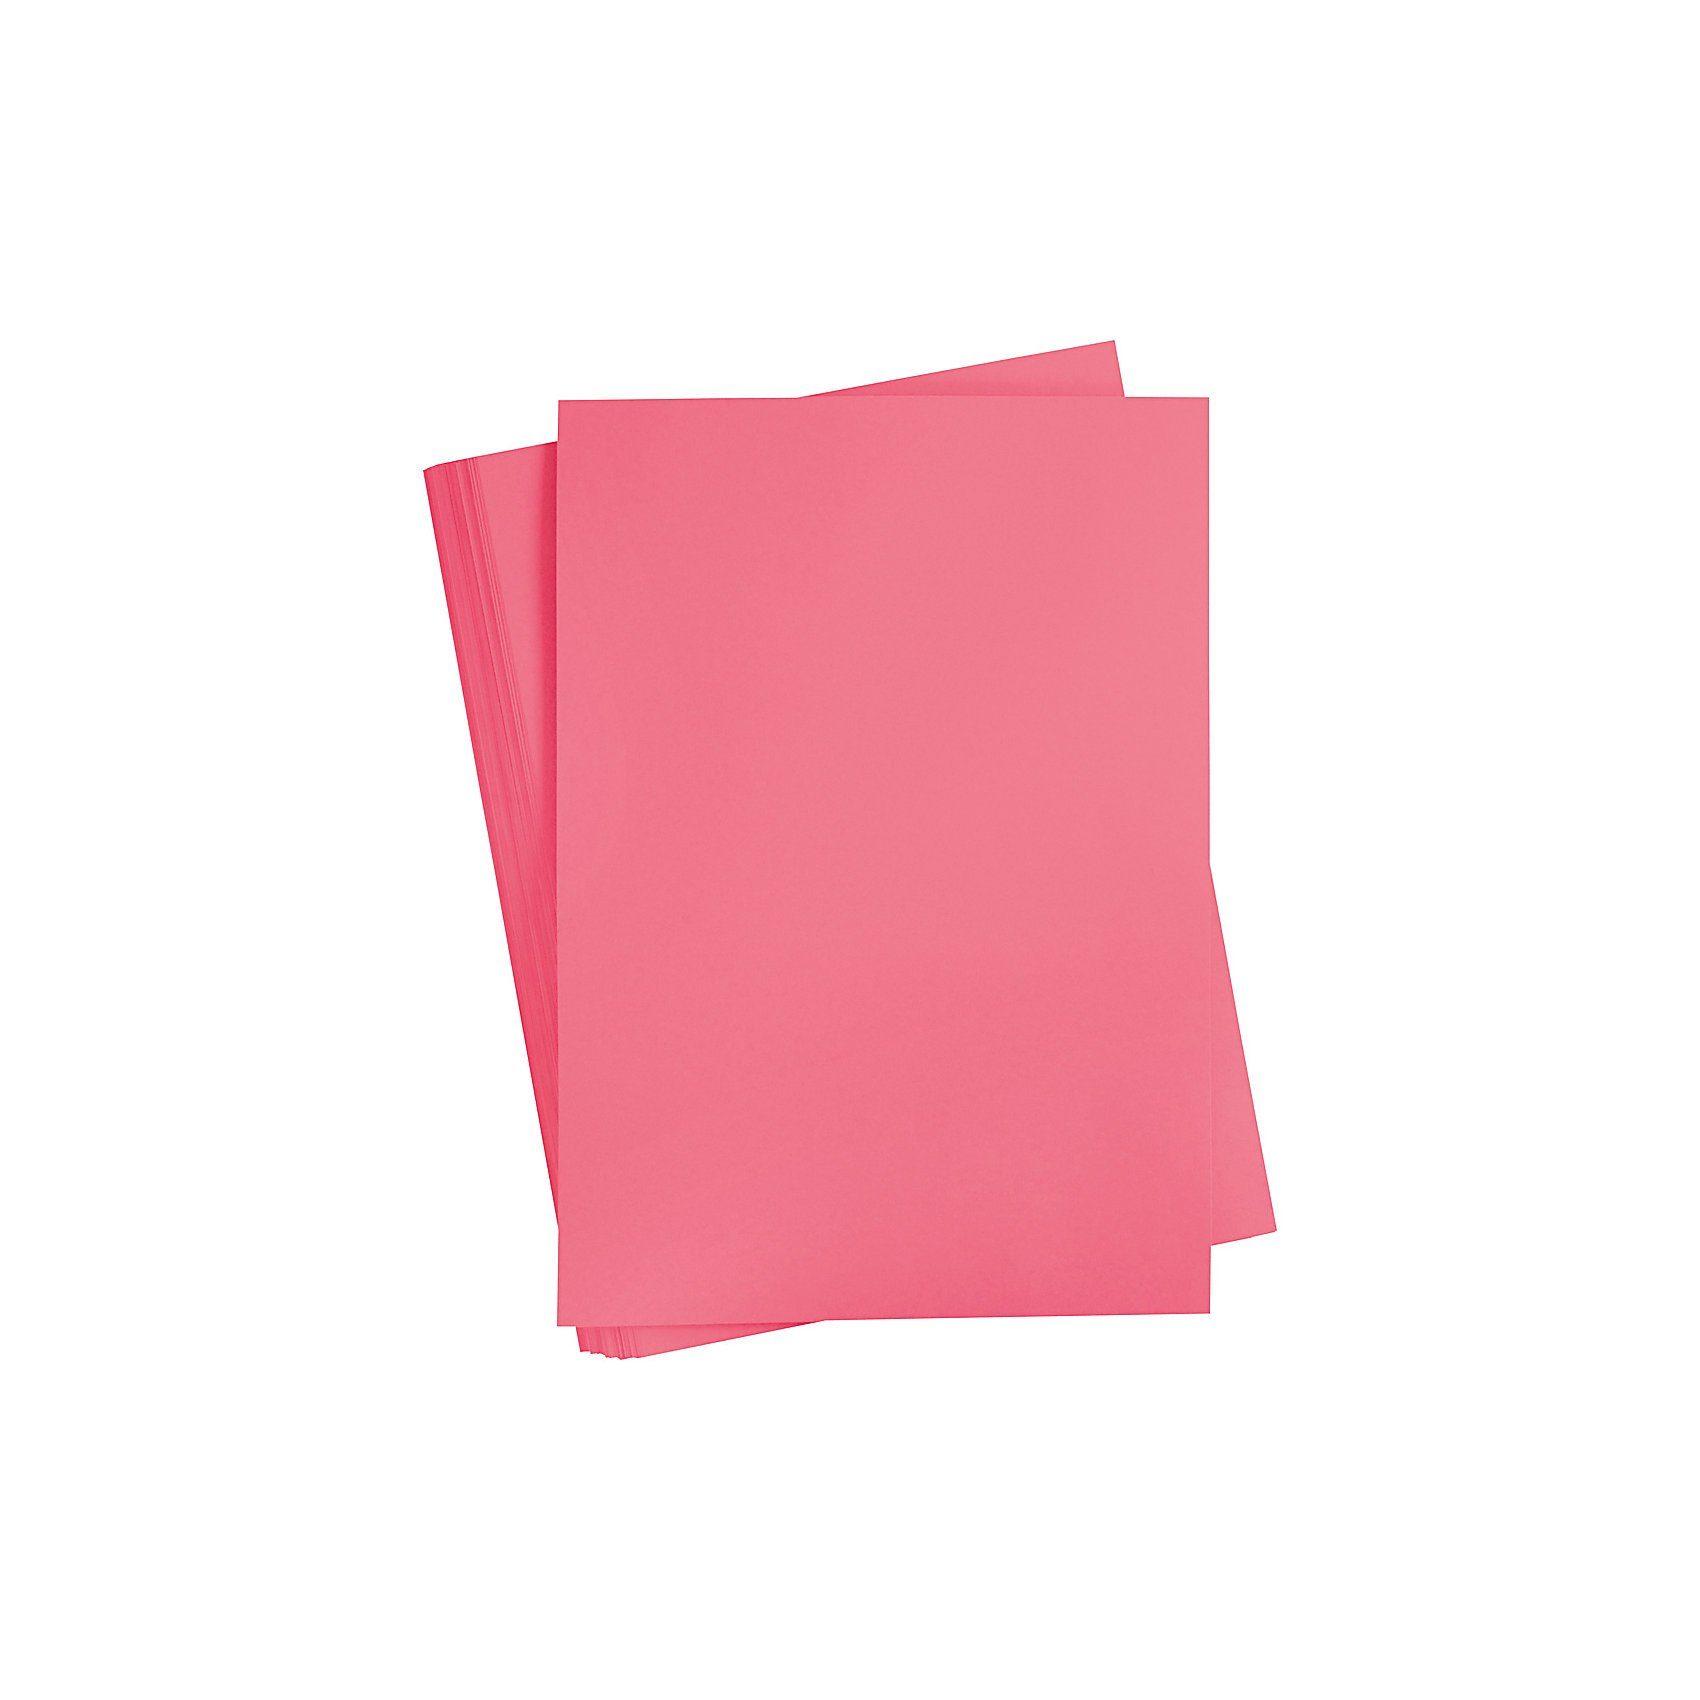 Karton, farbig, A2 420x600 mm, 180 g, Altrosa, 100 Blatt